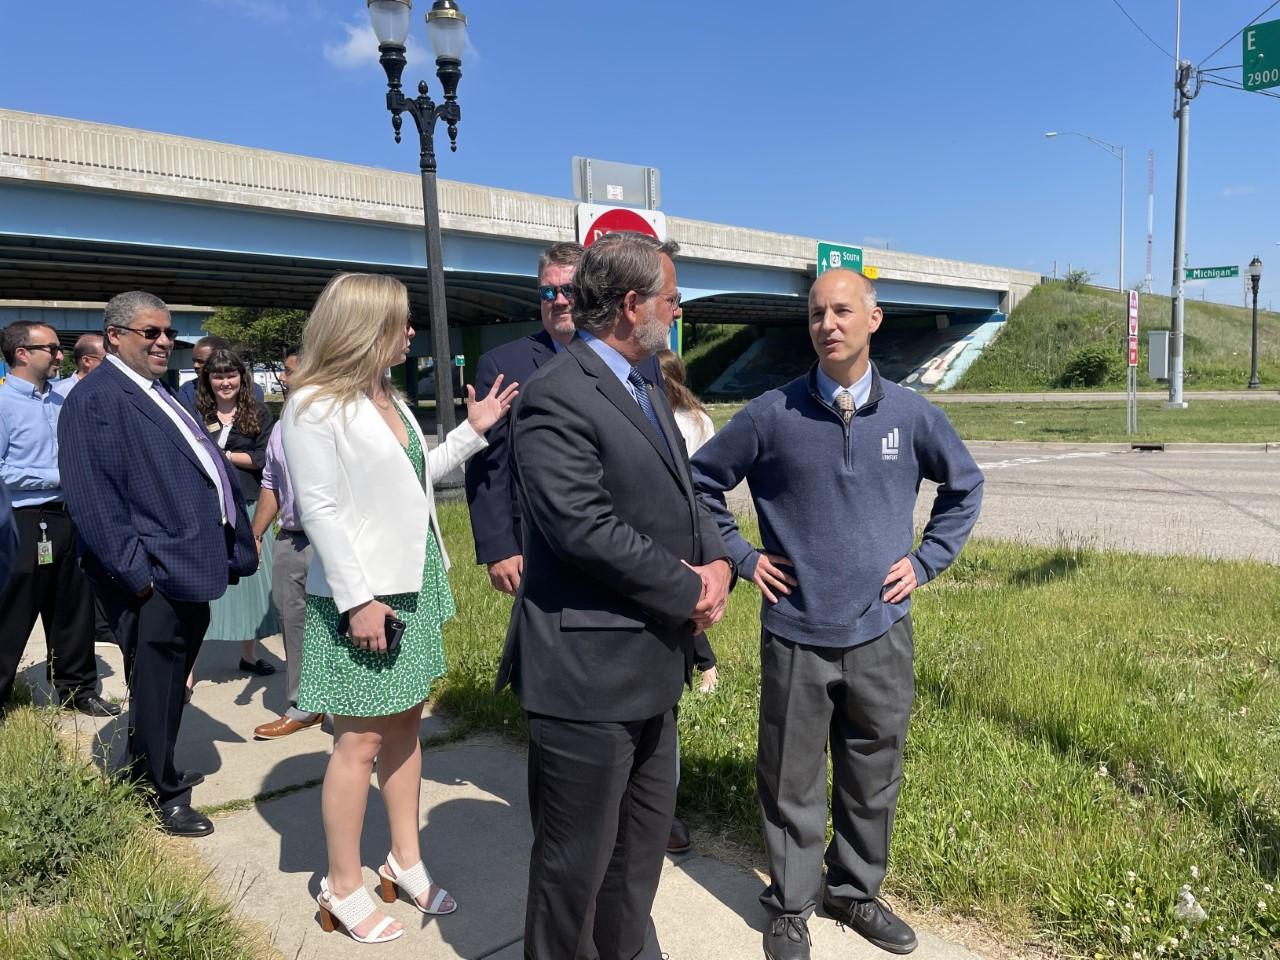 Sen. Gary Peters, and Lansing mayor Andy Schor touring Michigan Ave.